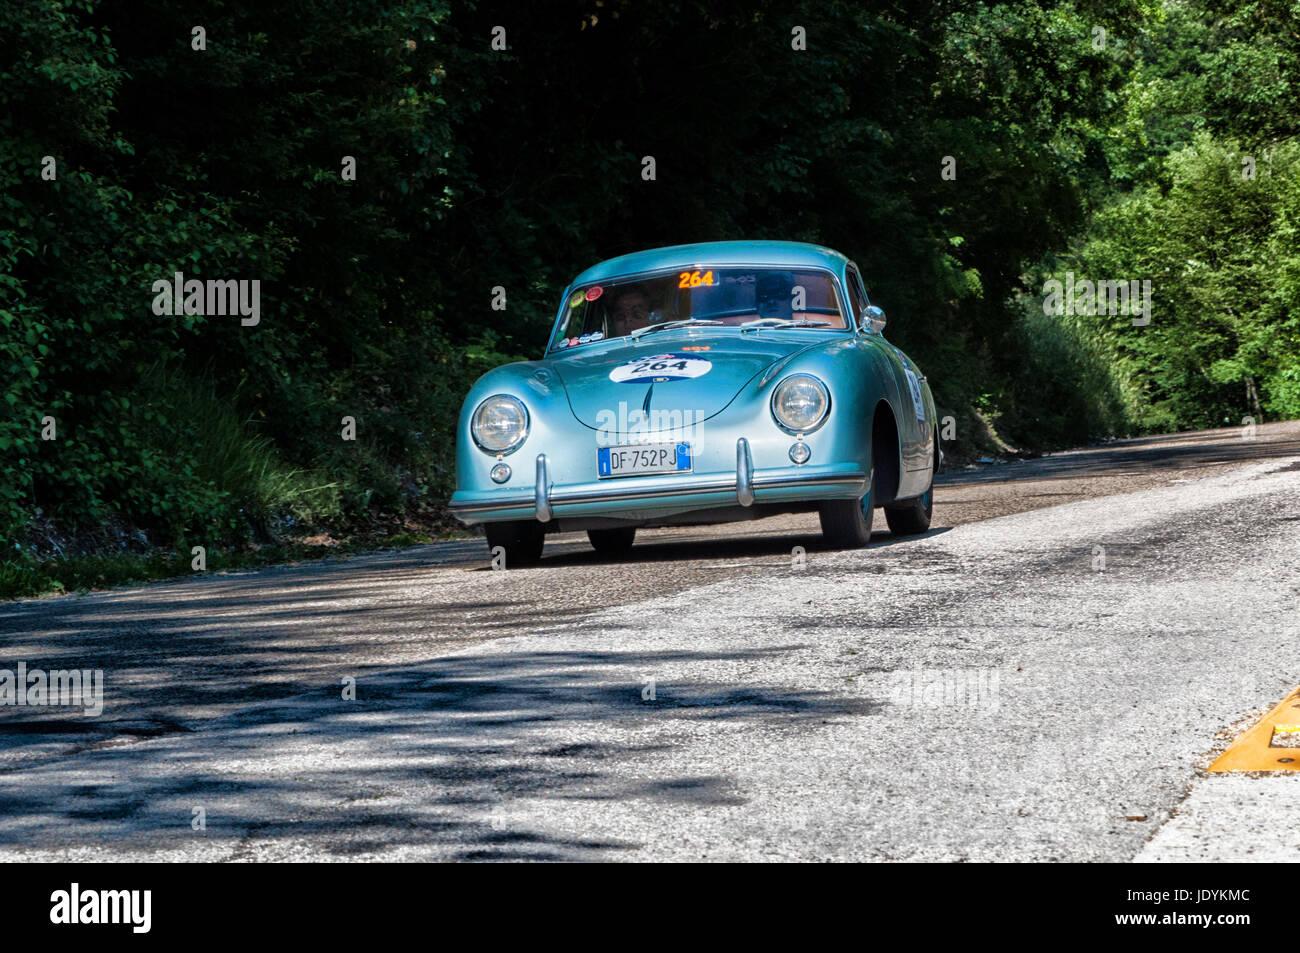 PORSCHE 356 1500 SUPER 1952 - Stock Image